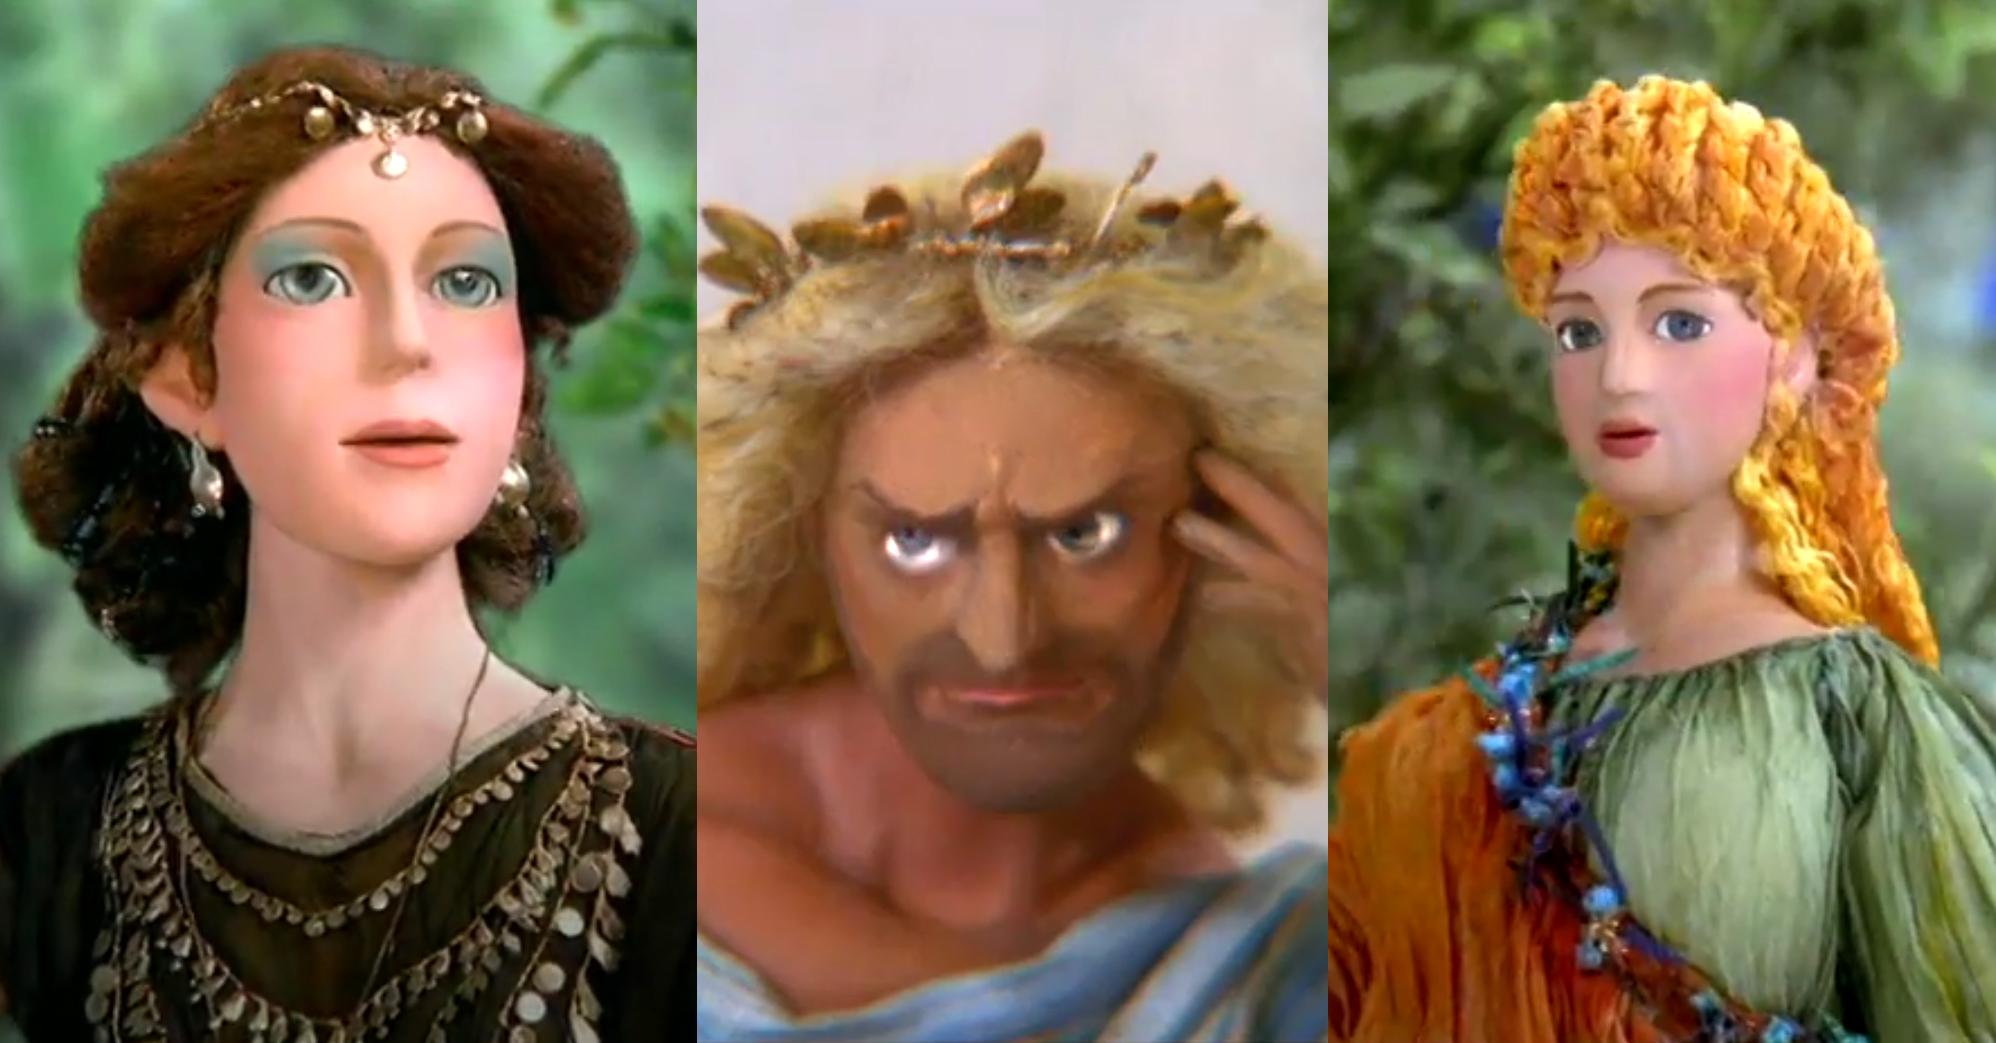 Sergei Olifirenko, Russische regisseur animaties, Persephone, mythologie animatie, poppenfilm voor kinderen, Hades, Demeter, Griekse mythe